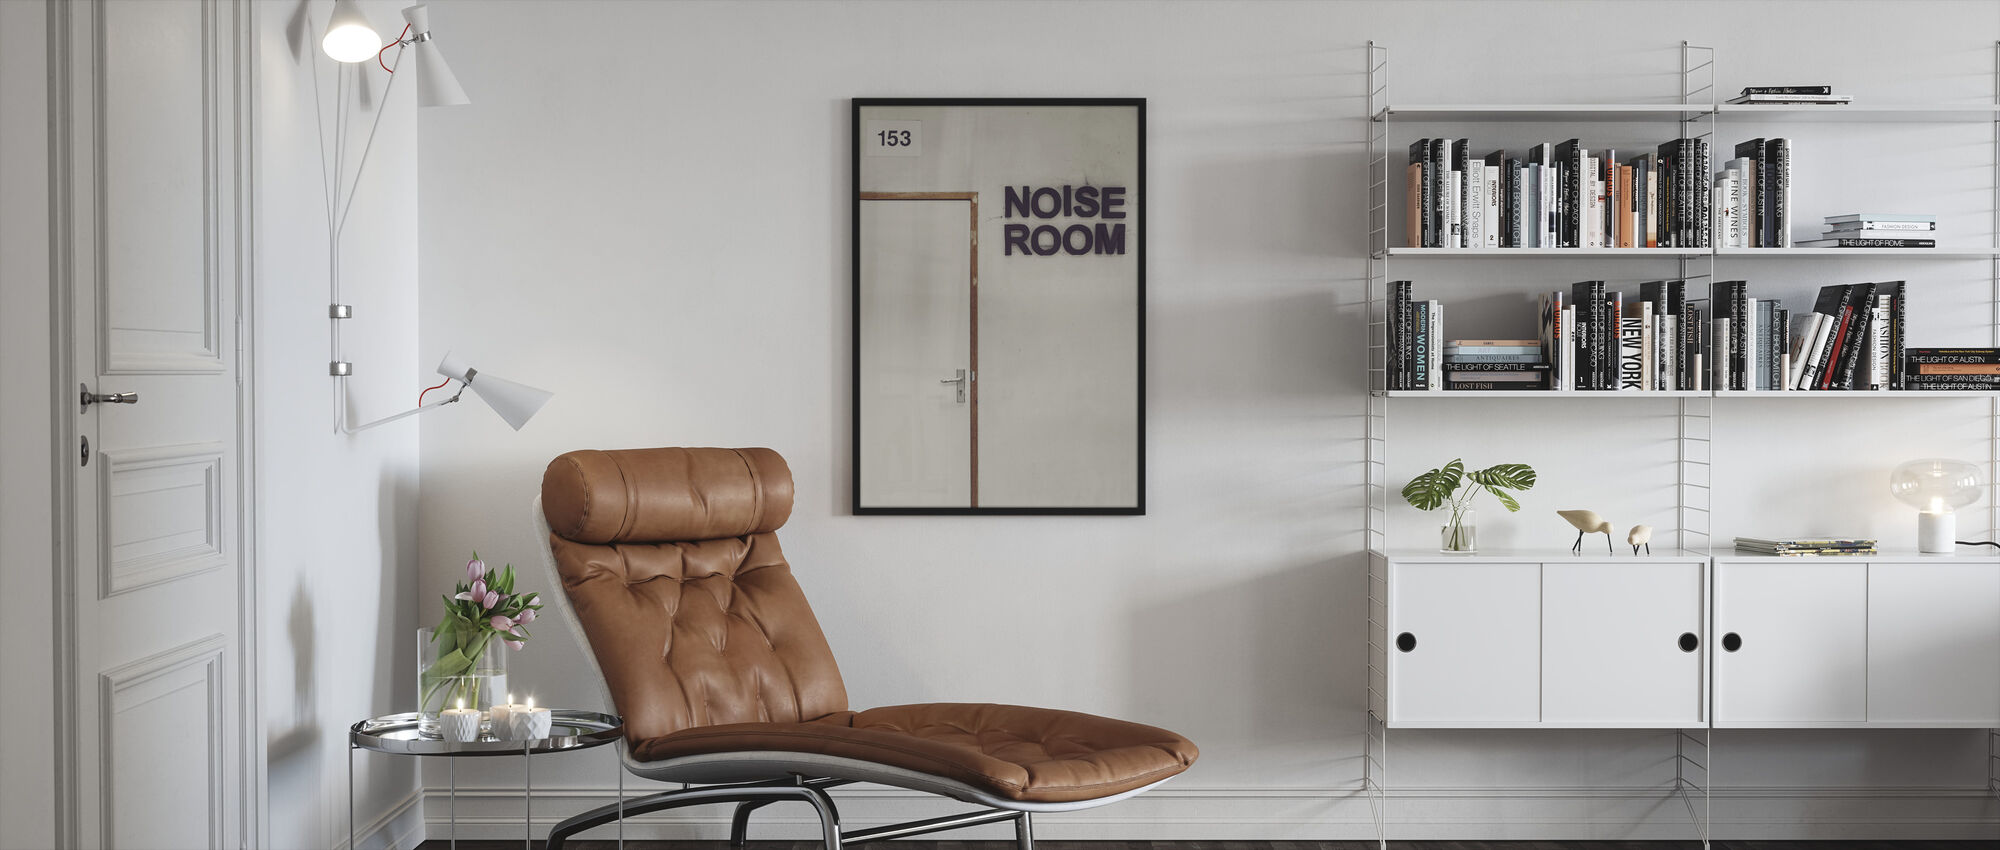 Noise Room Door - Framed print - Living Room